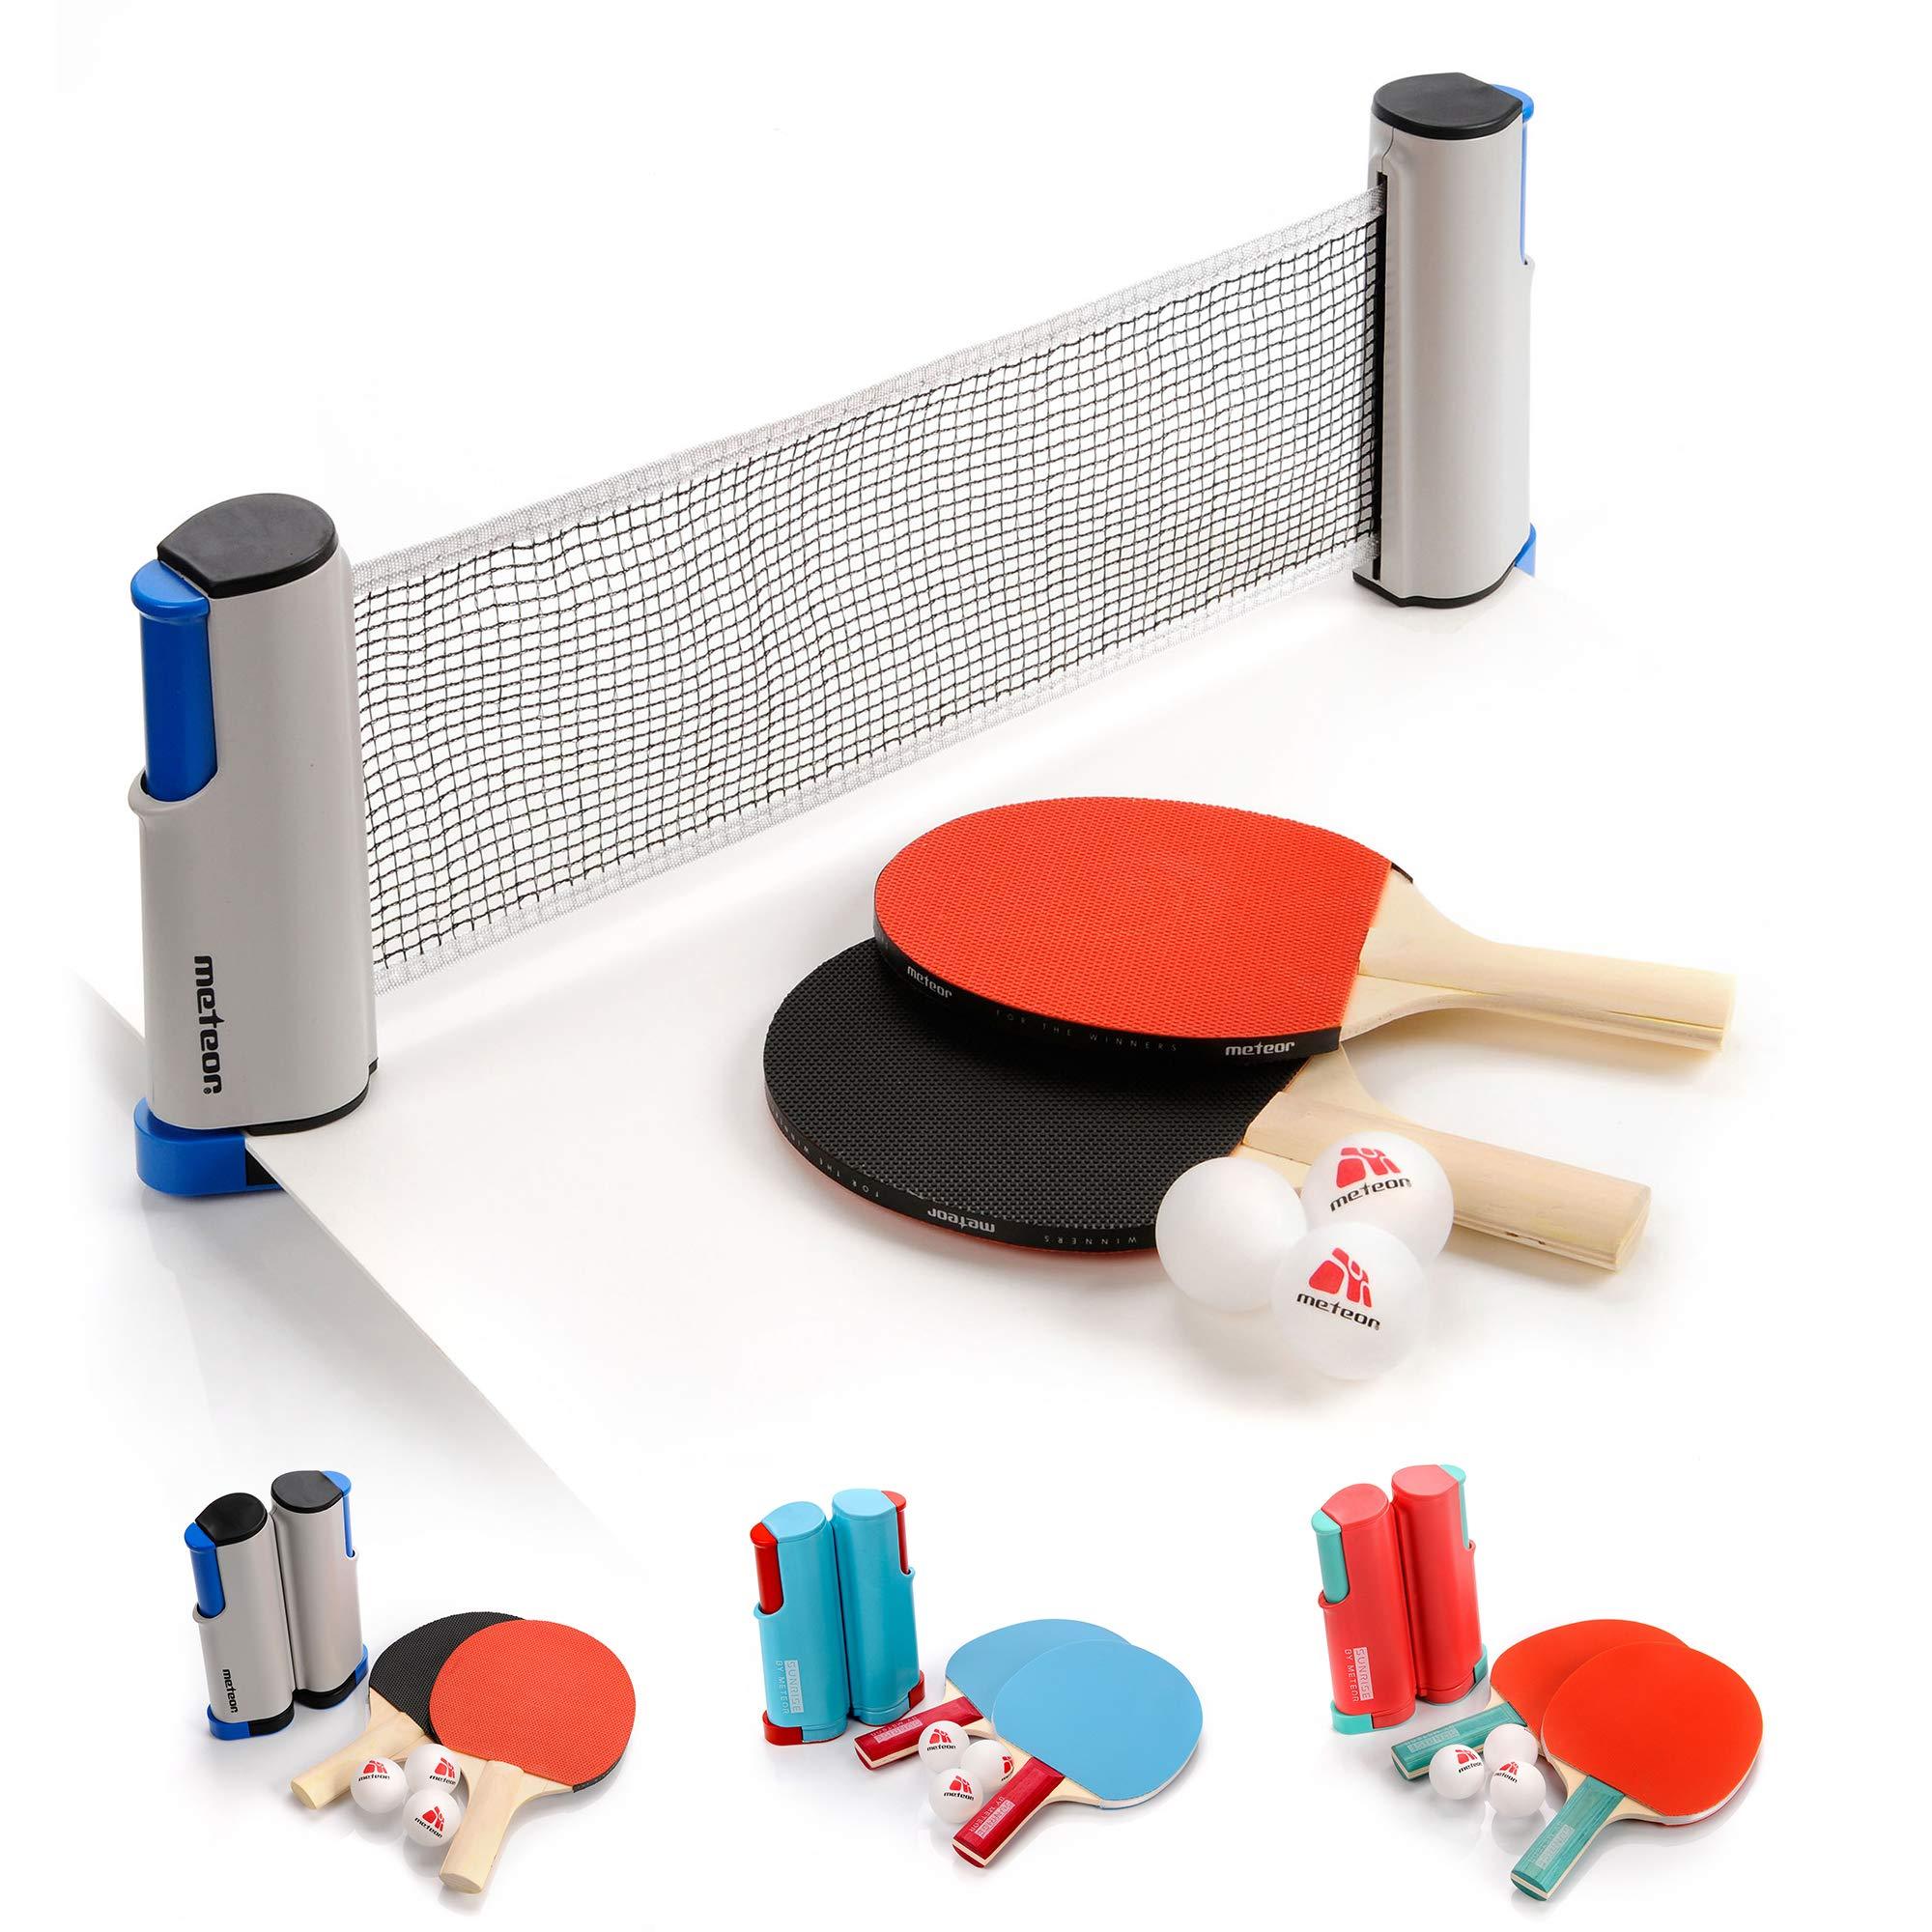 Instant Table Tennis Kit Ping Pong Set Portable Retractable Net 2 Bats